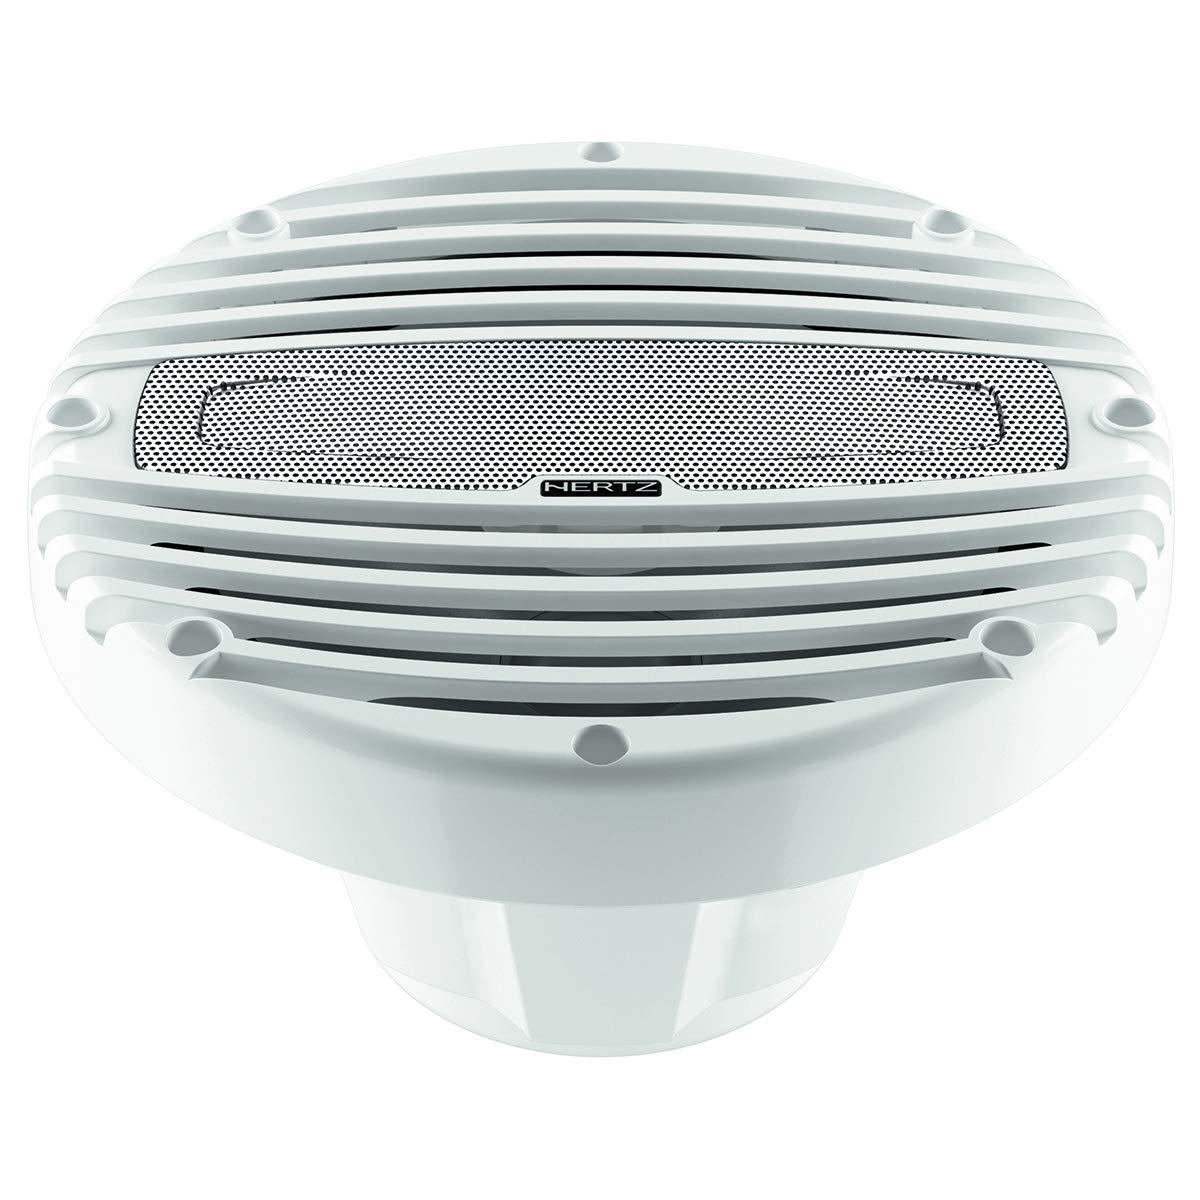 "Hertz Audio HMX 8 8"" Marine Coaxial Speakers 4 Ohm 200W"